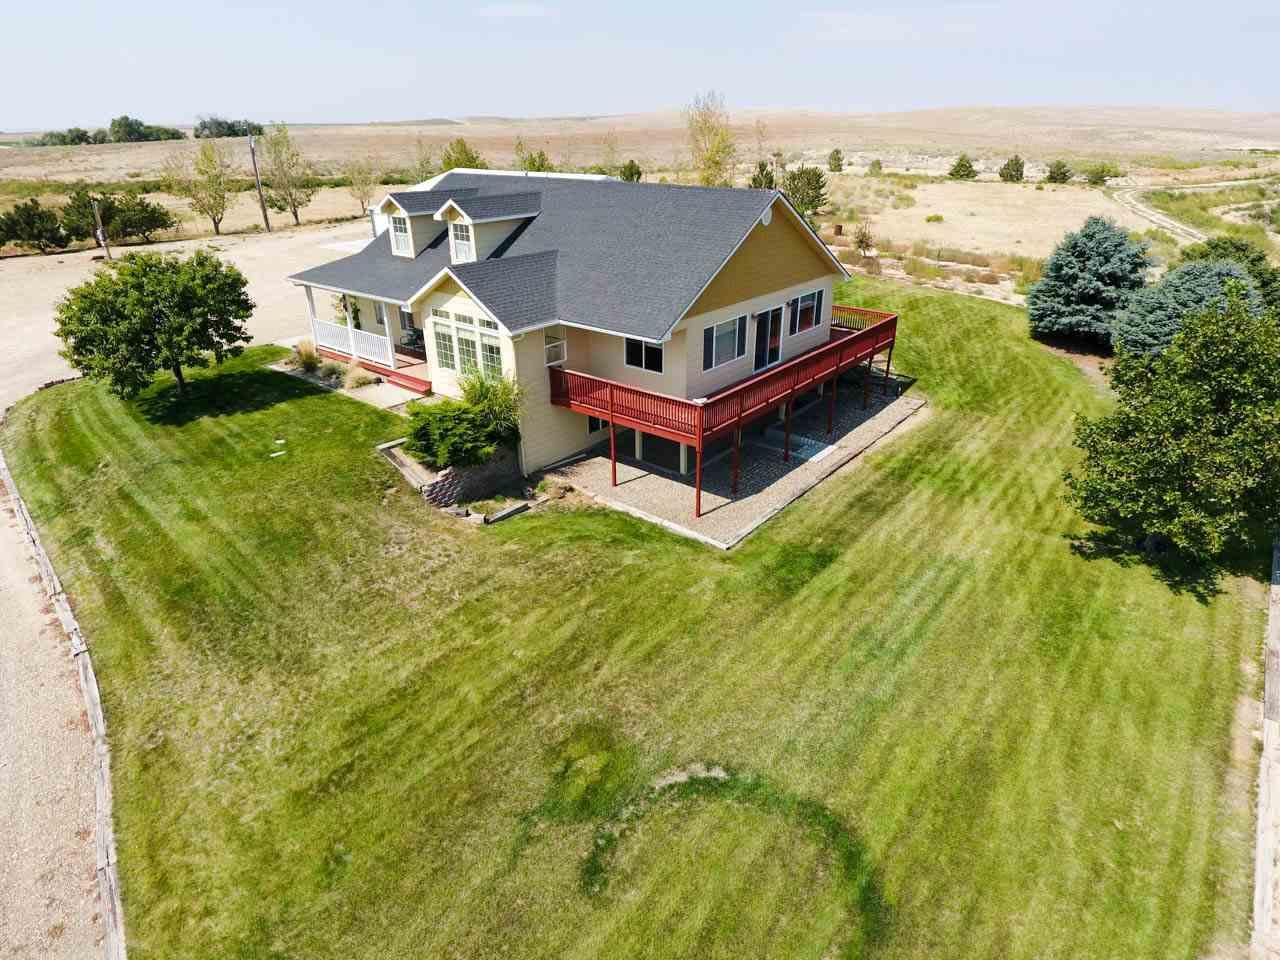 Single Family Home for Sale at 21250 Market Road 21250 Market Road Parma, Idaho 83660